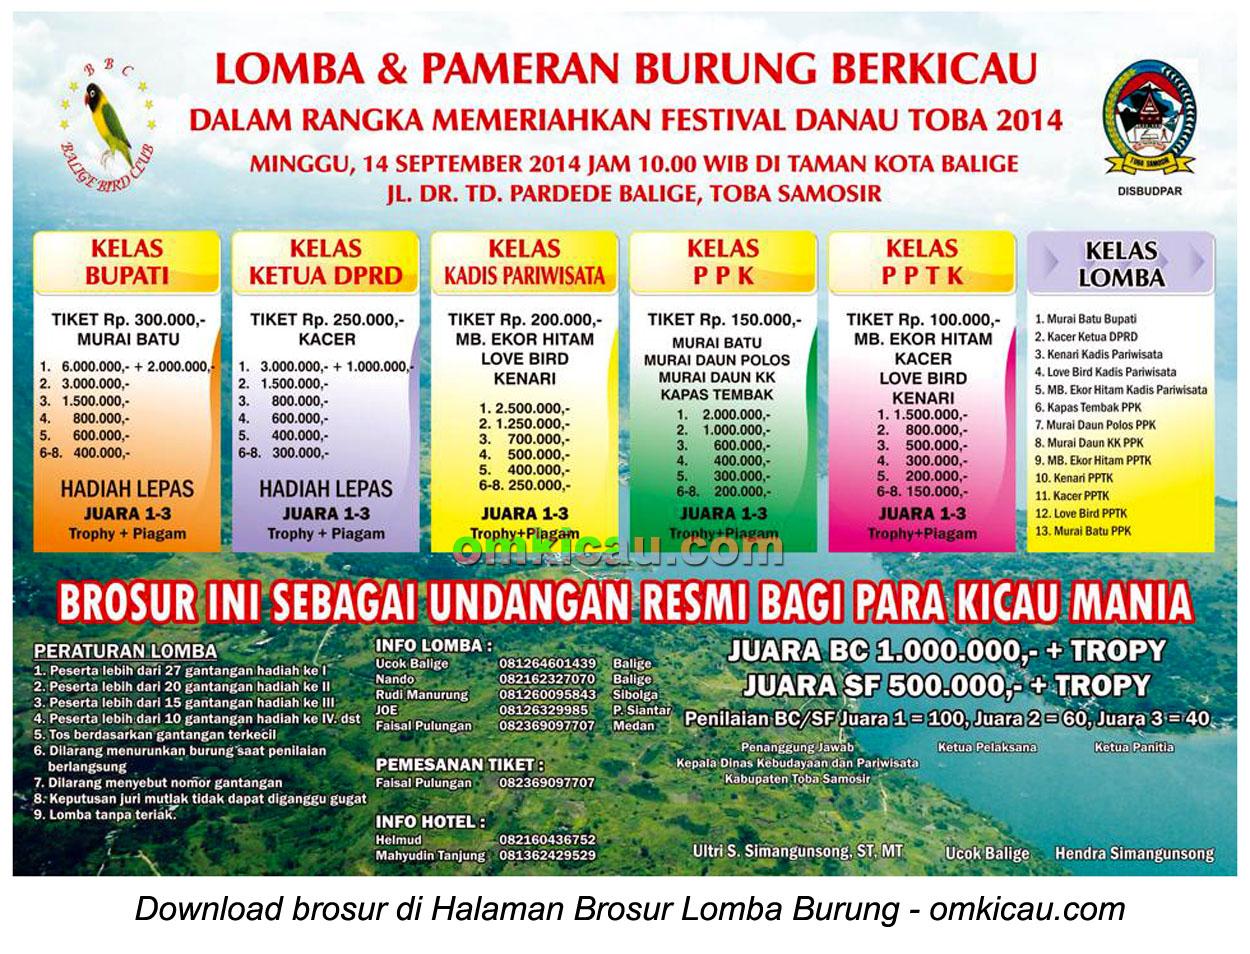 Brosur Lomba Burung Berkicau Festival Danau Toba, Toba Samosir, 14 September 2014